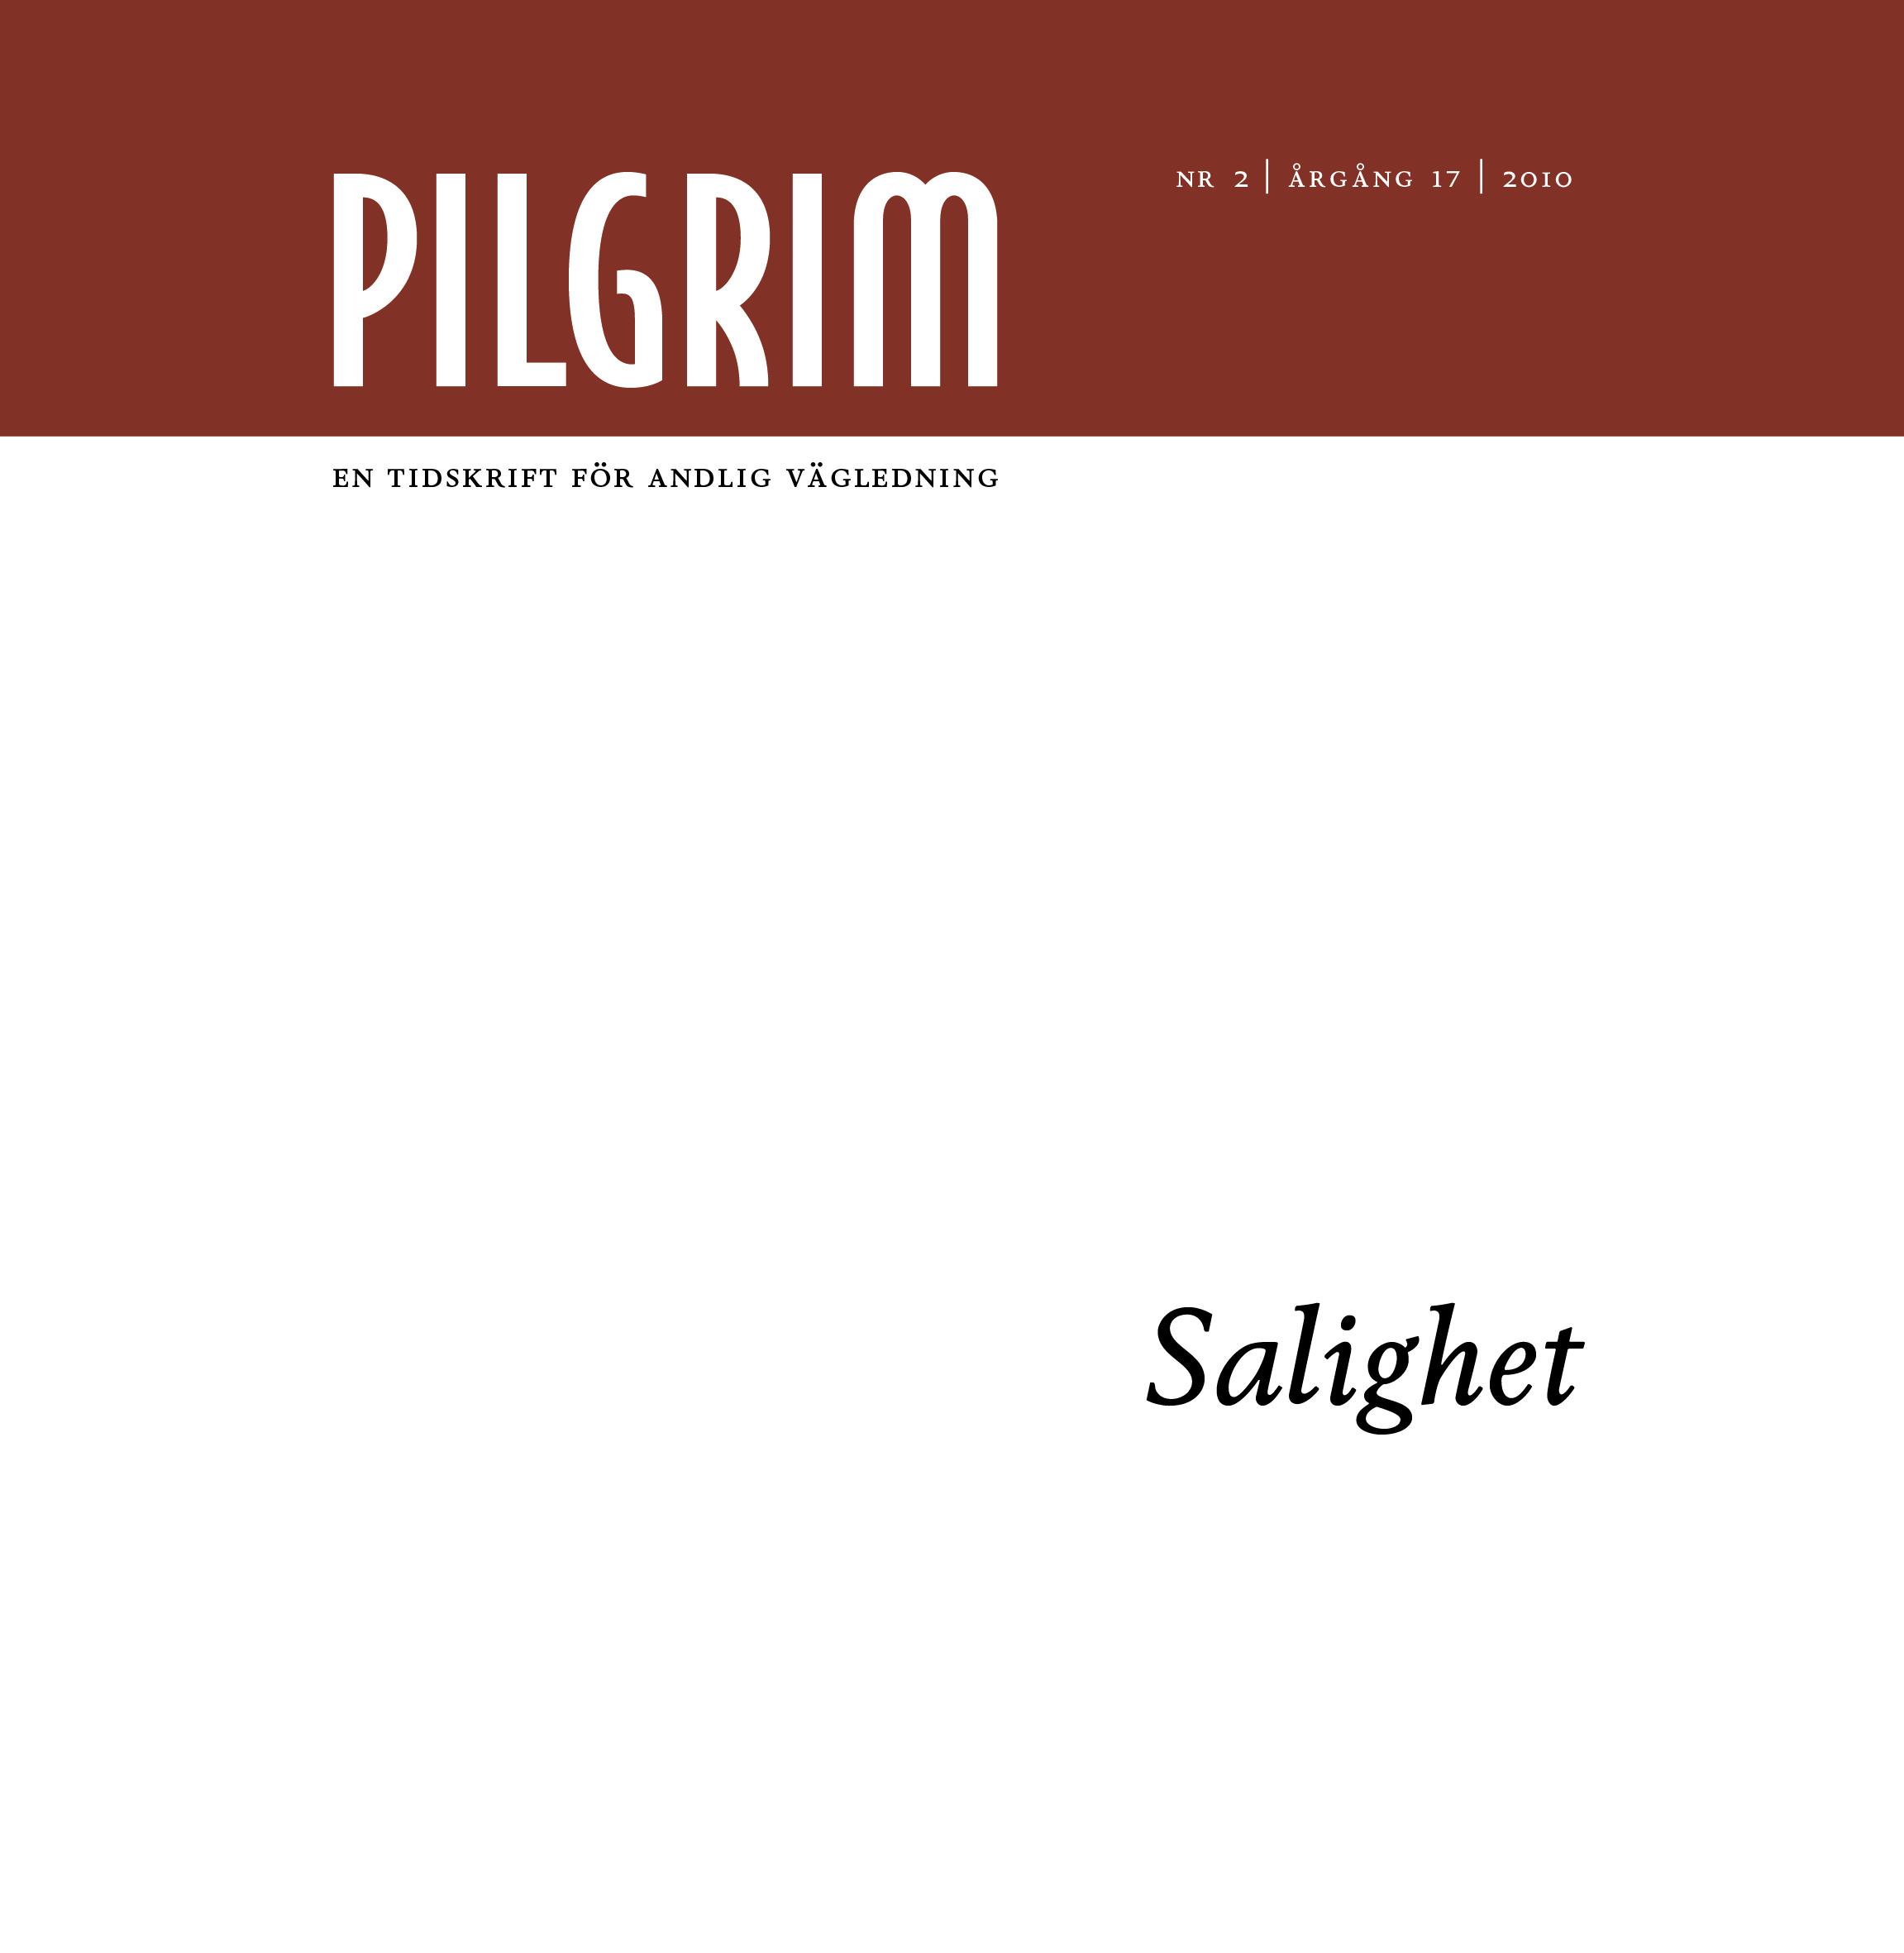 Pilgrim frams 2010-2